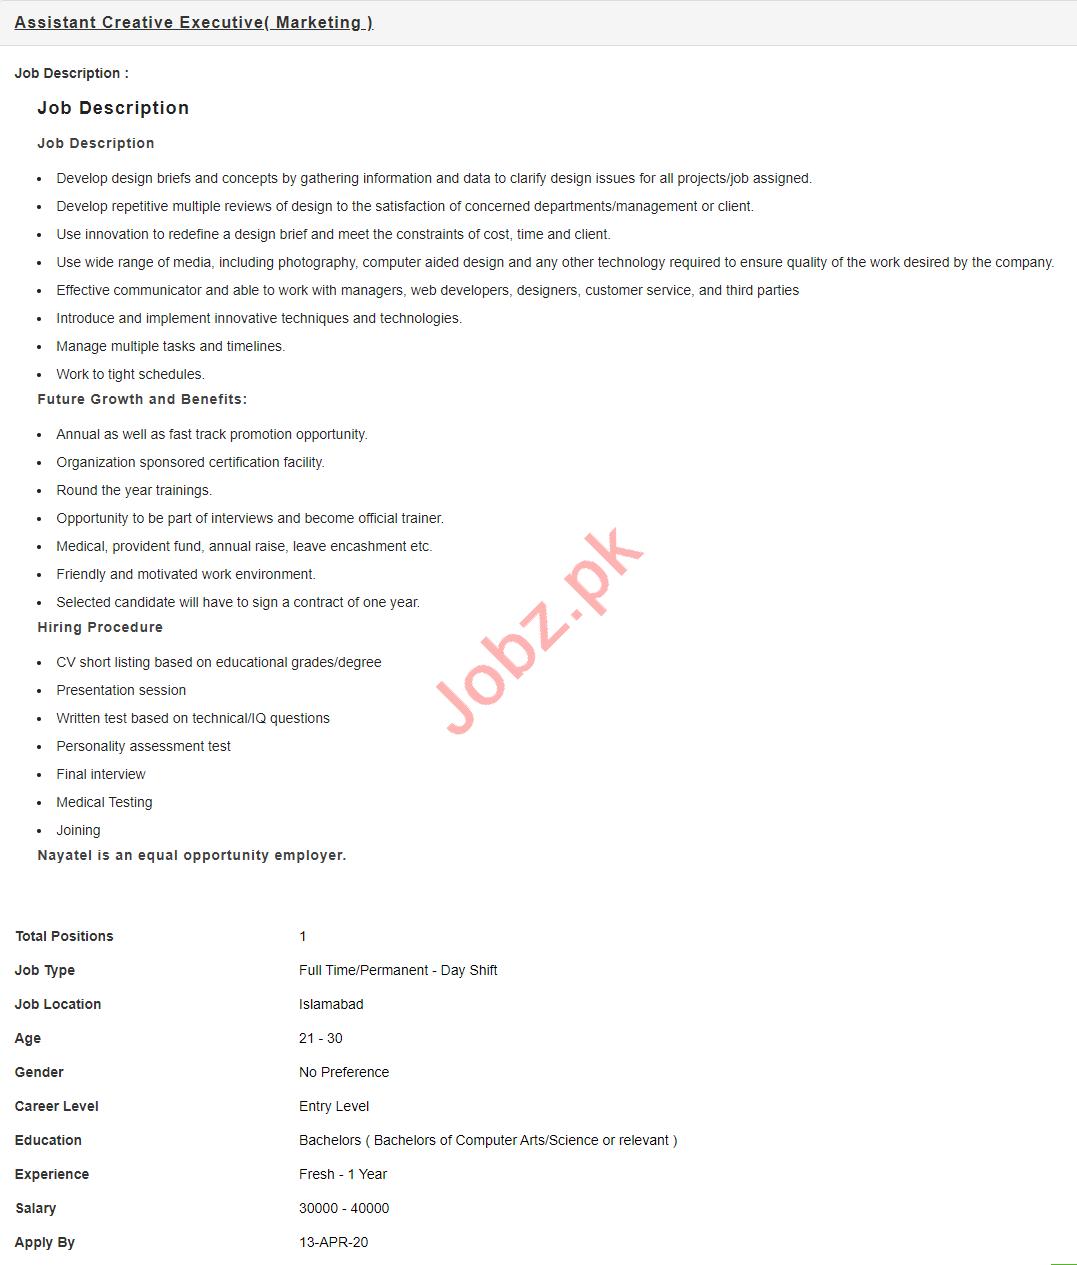 Assistant Creative Executive Jobs 2020 in Nayatel Islamabad